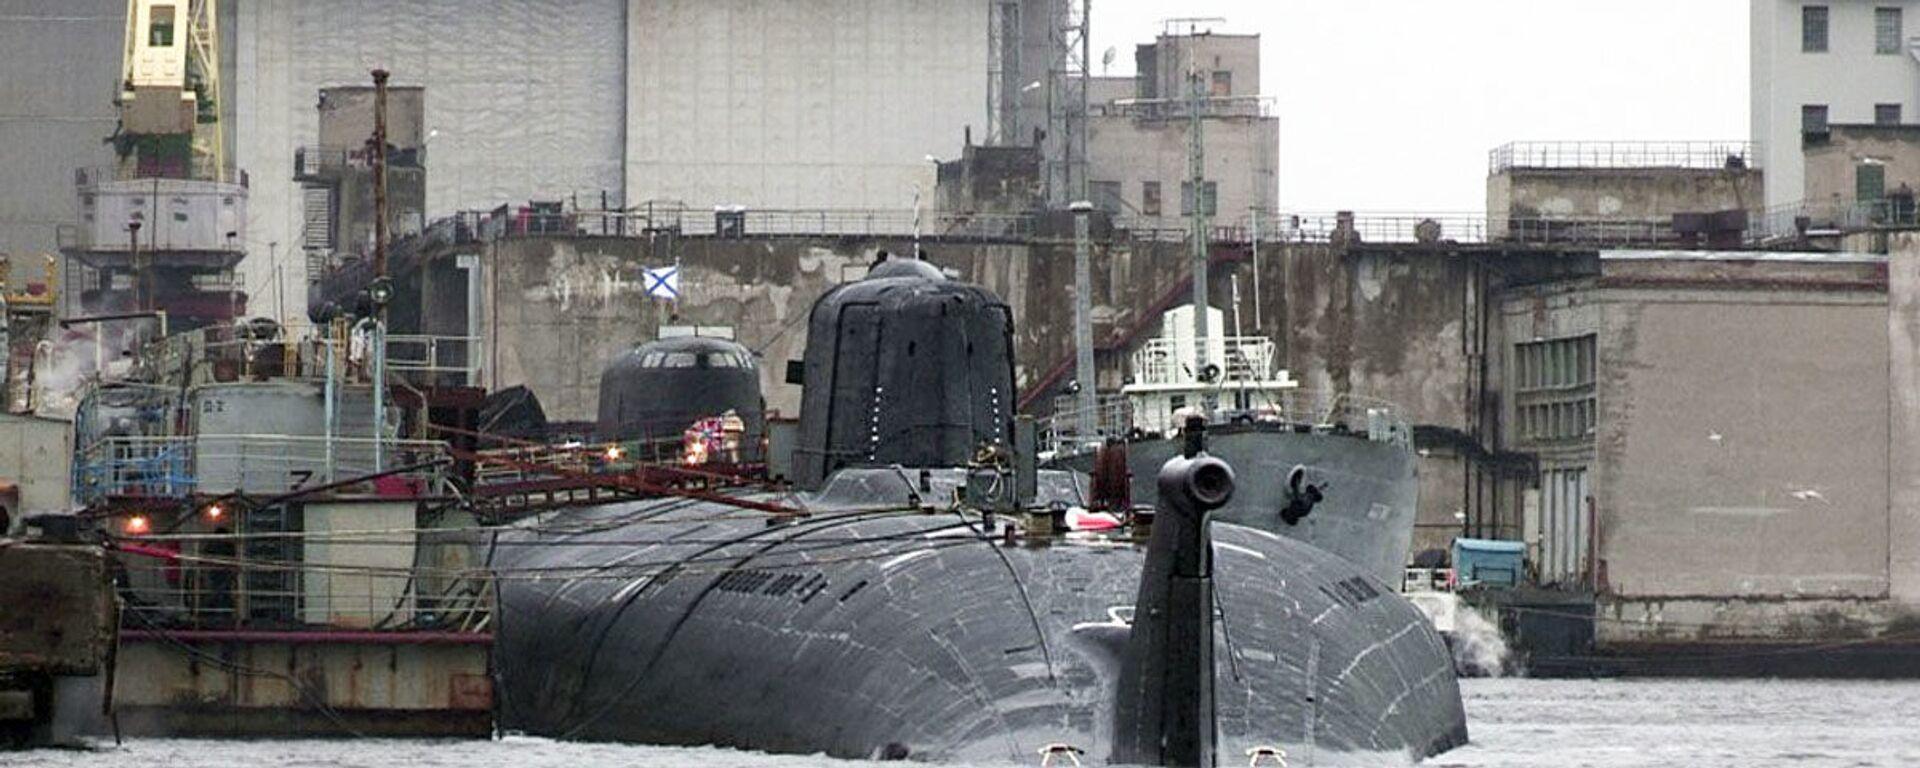 "Okręt podwodny K-266 ""Orzeł"" - Sputnik Polska, 1920, 05.08.2021"